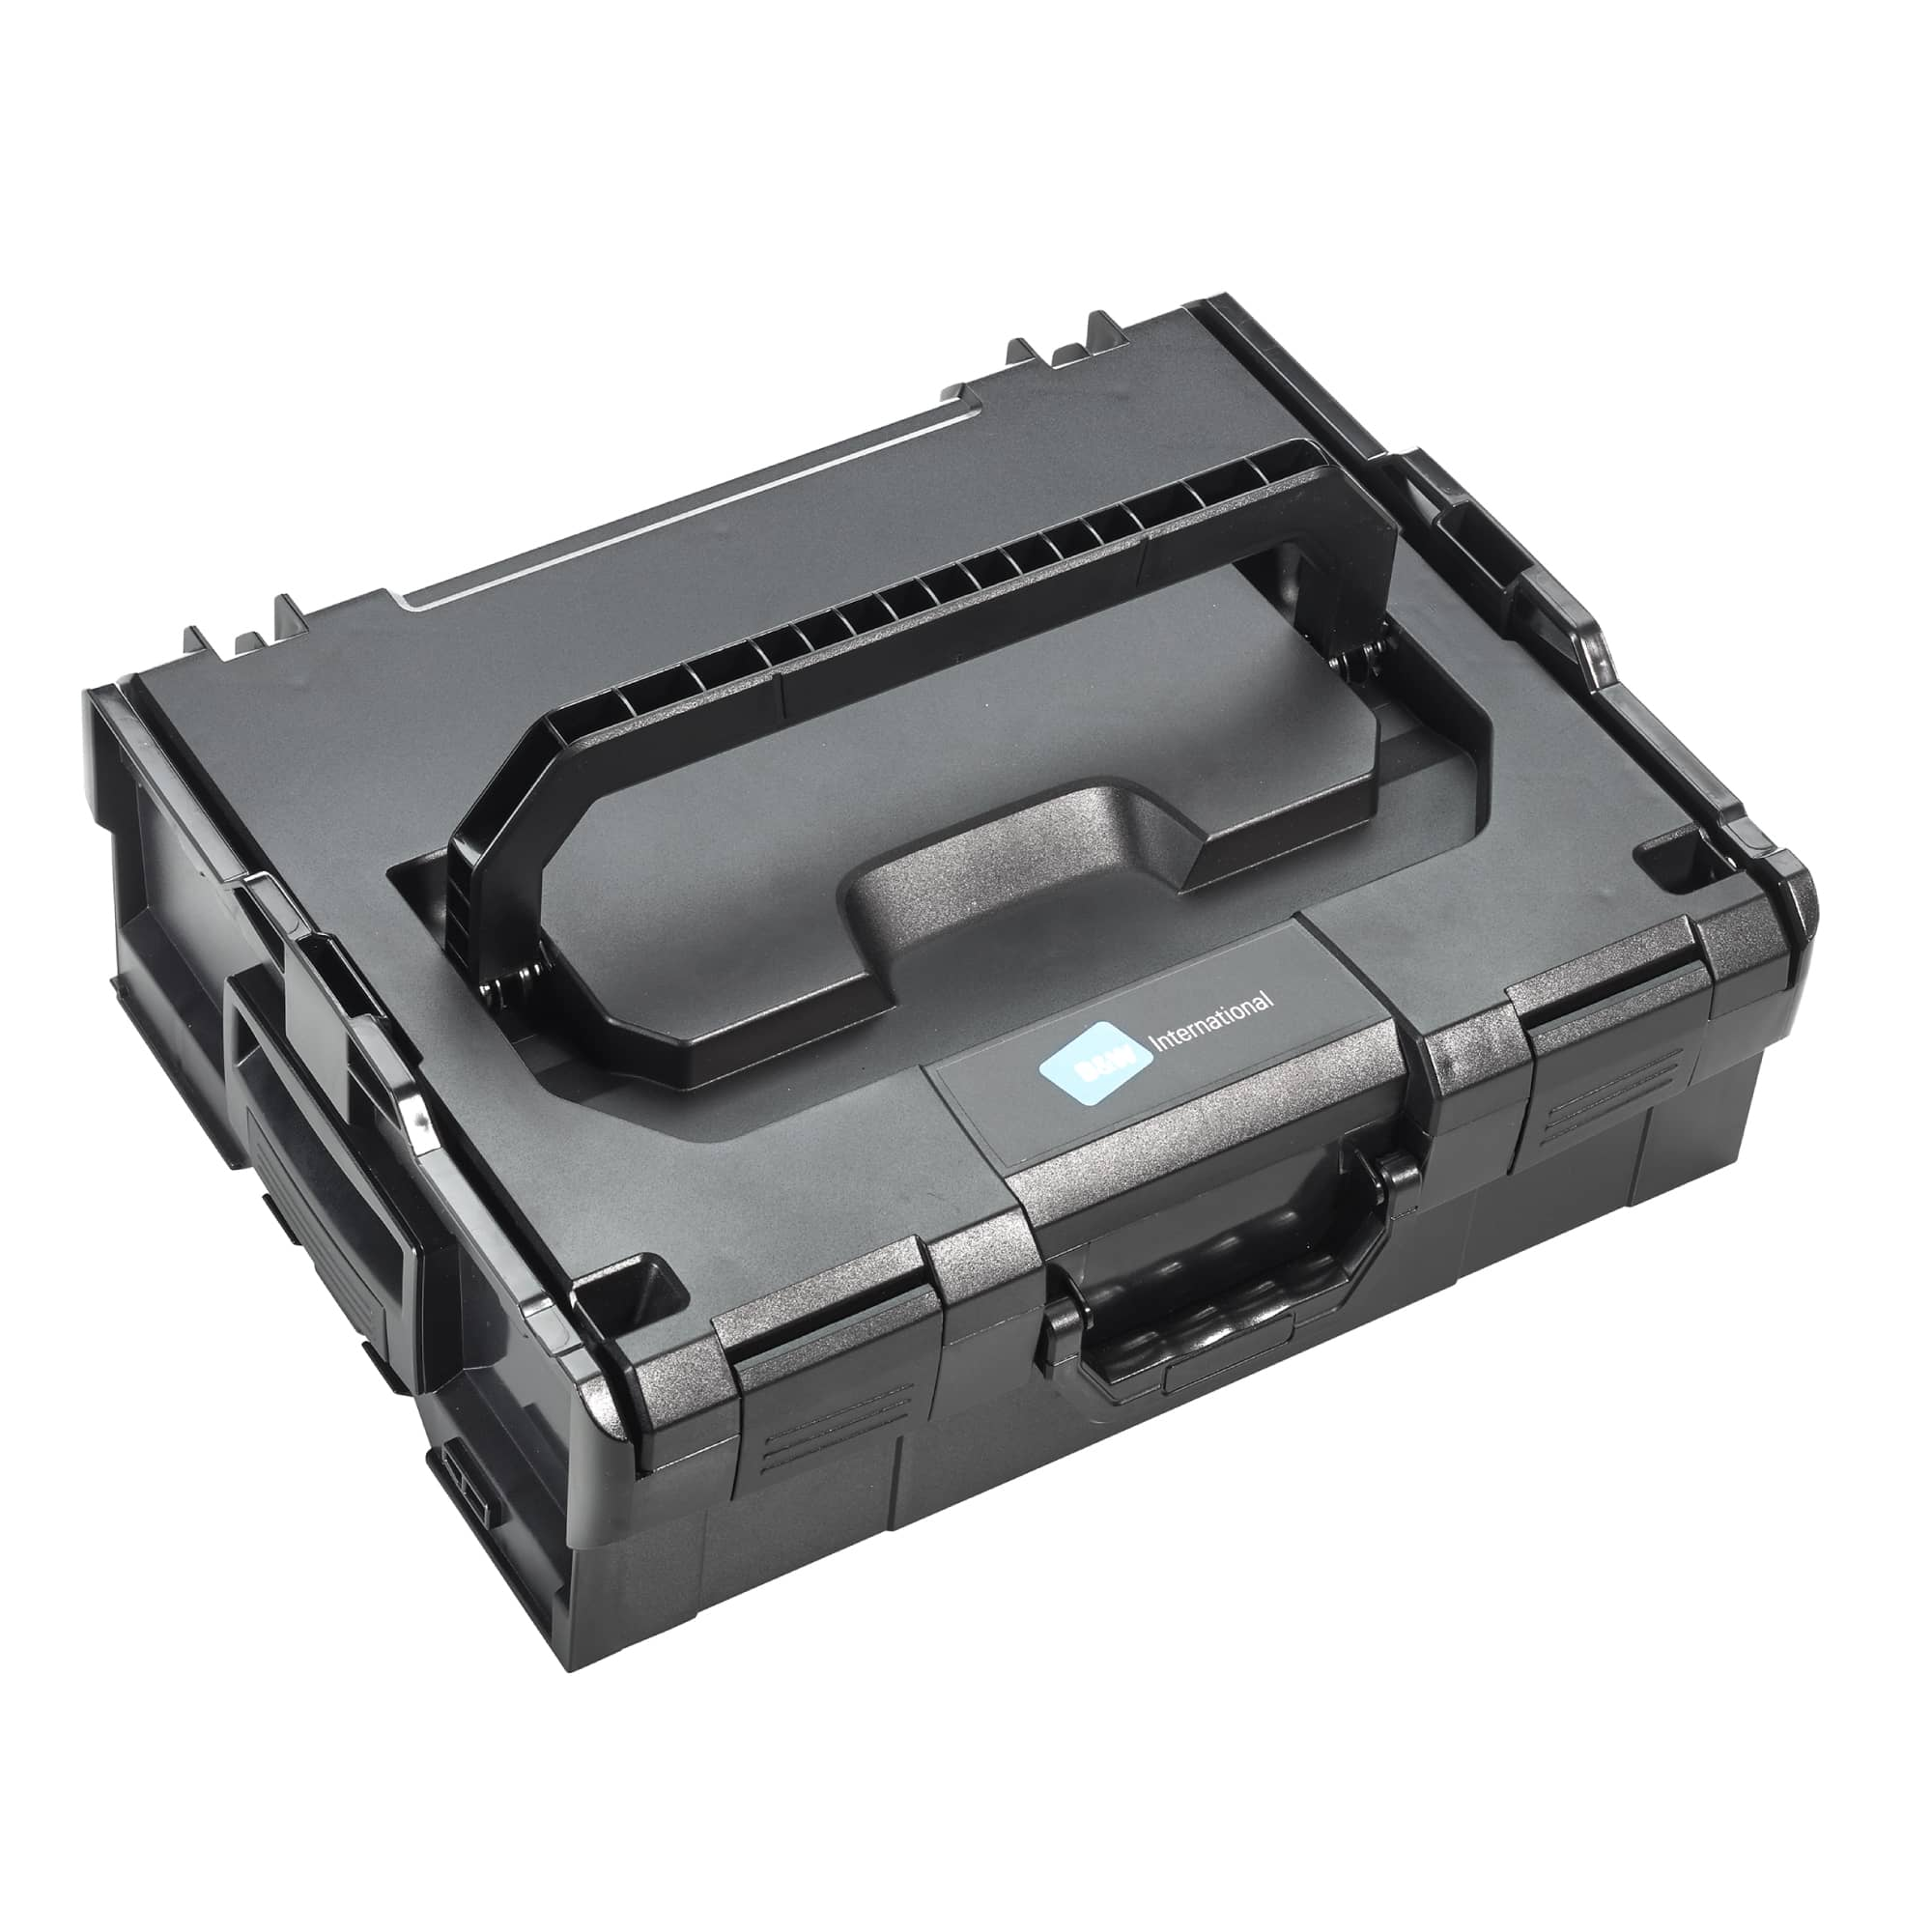 B&W Tool.case L-BOXX 136 FG